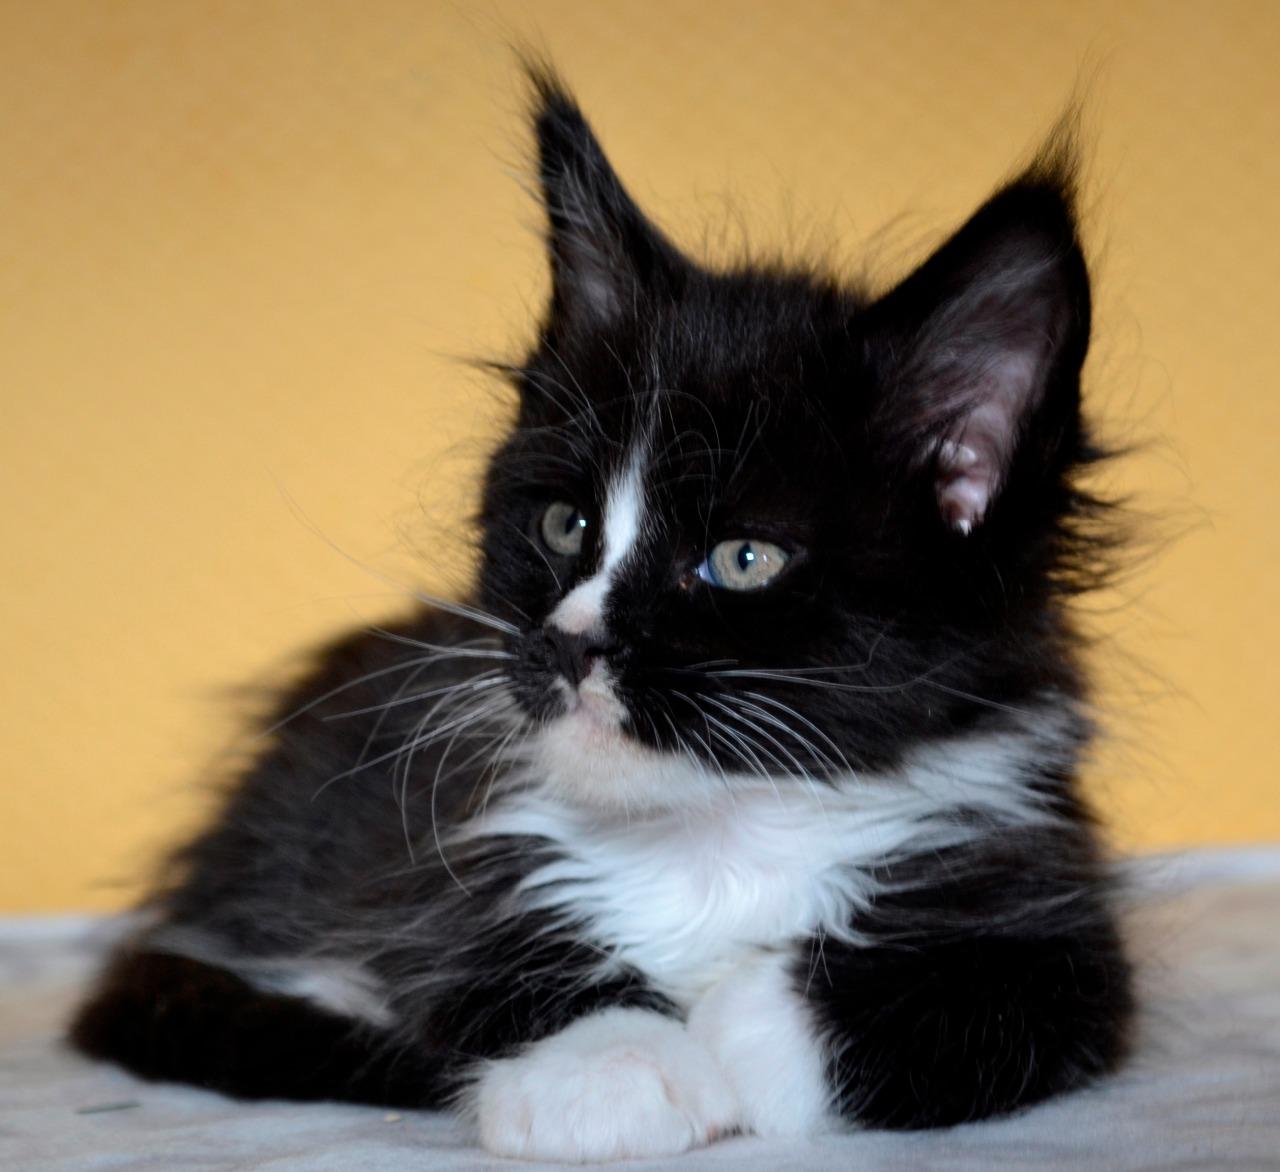 Oholil kočička vid